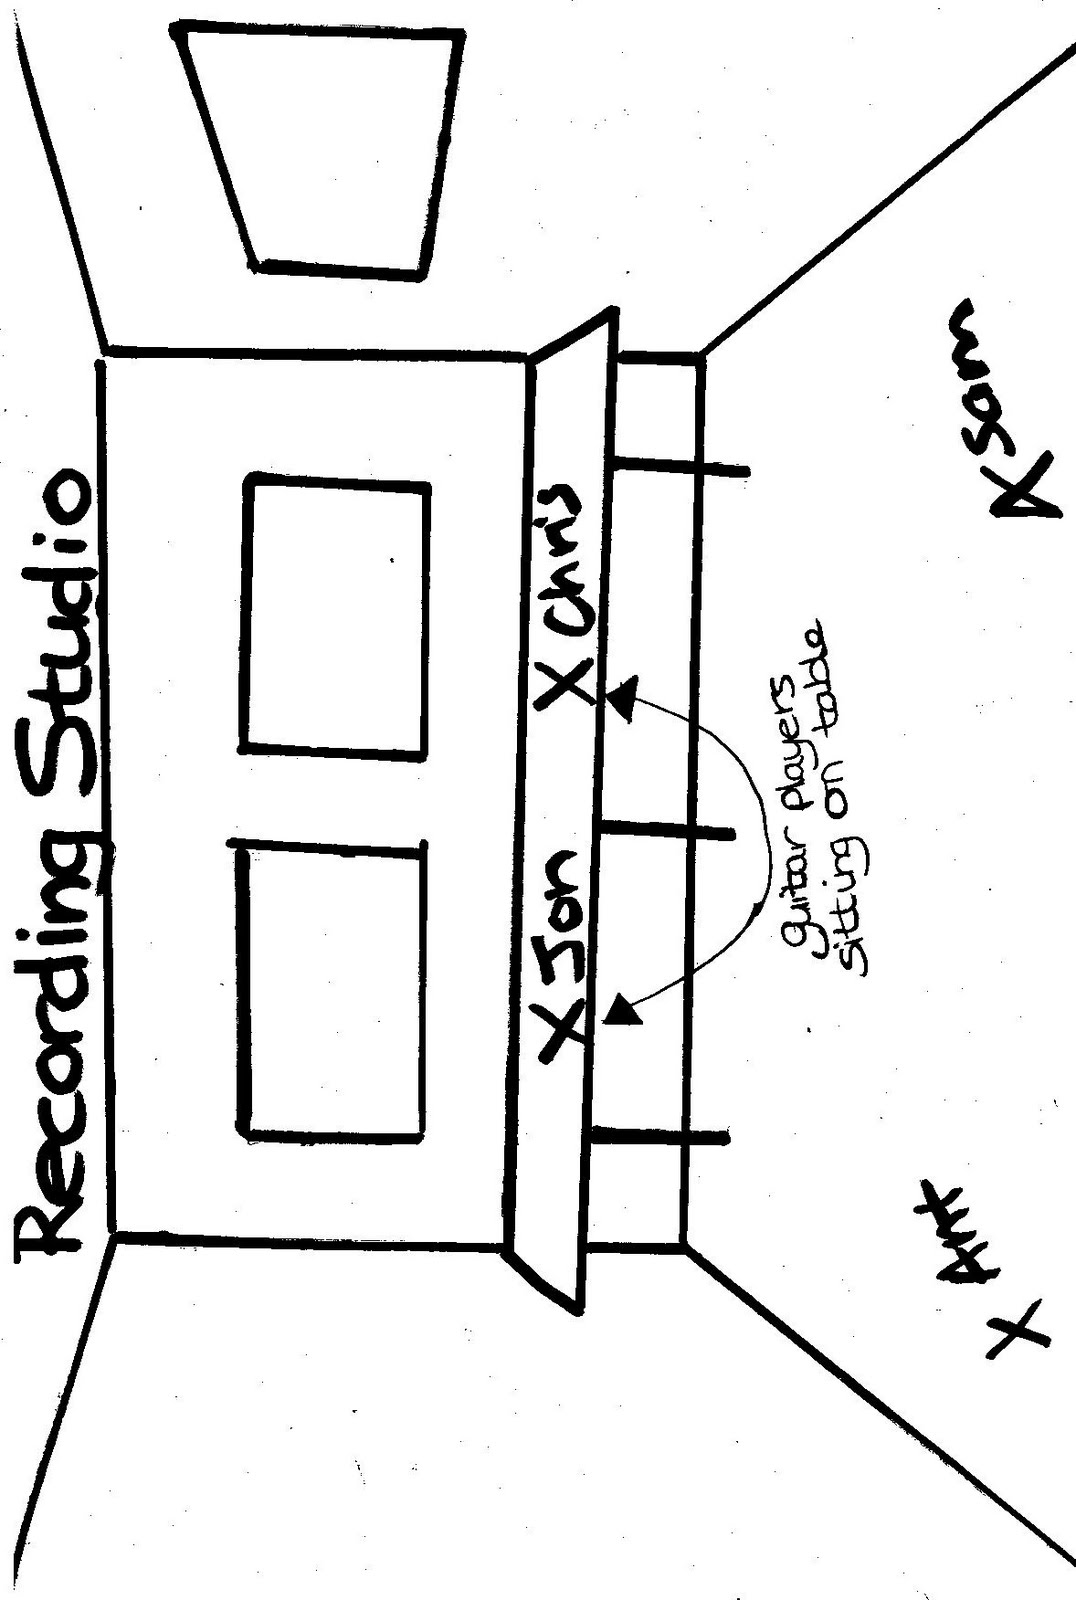 Melbournemedia Recording Studio Floor Plans